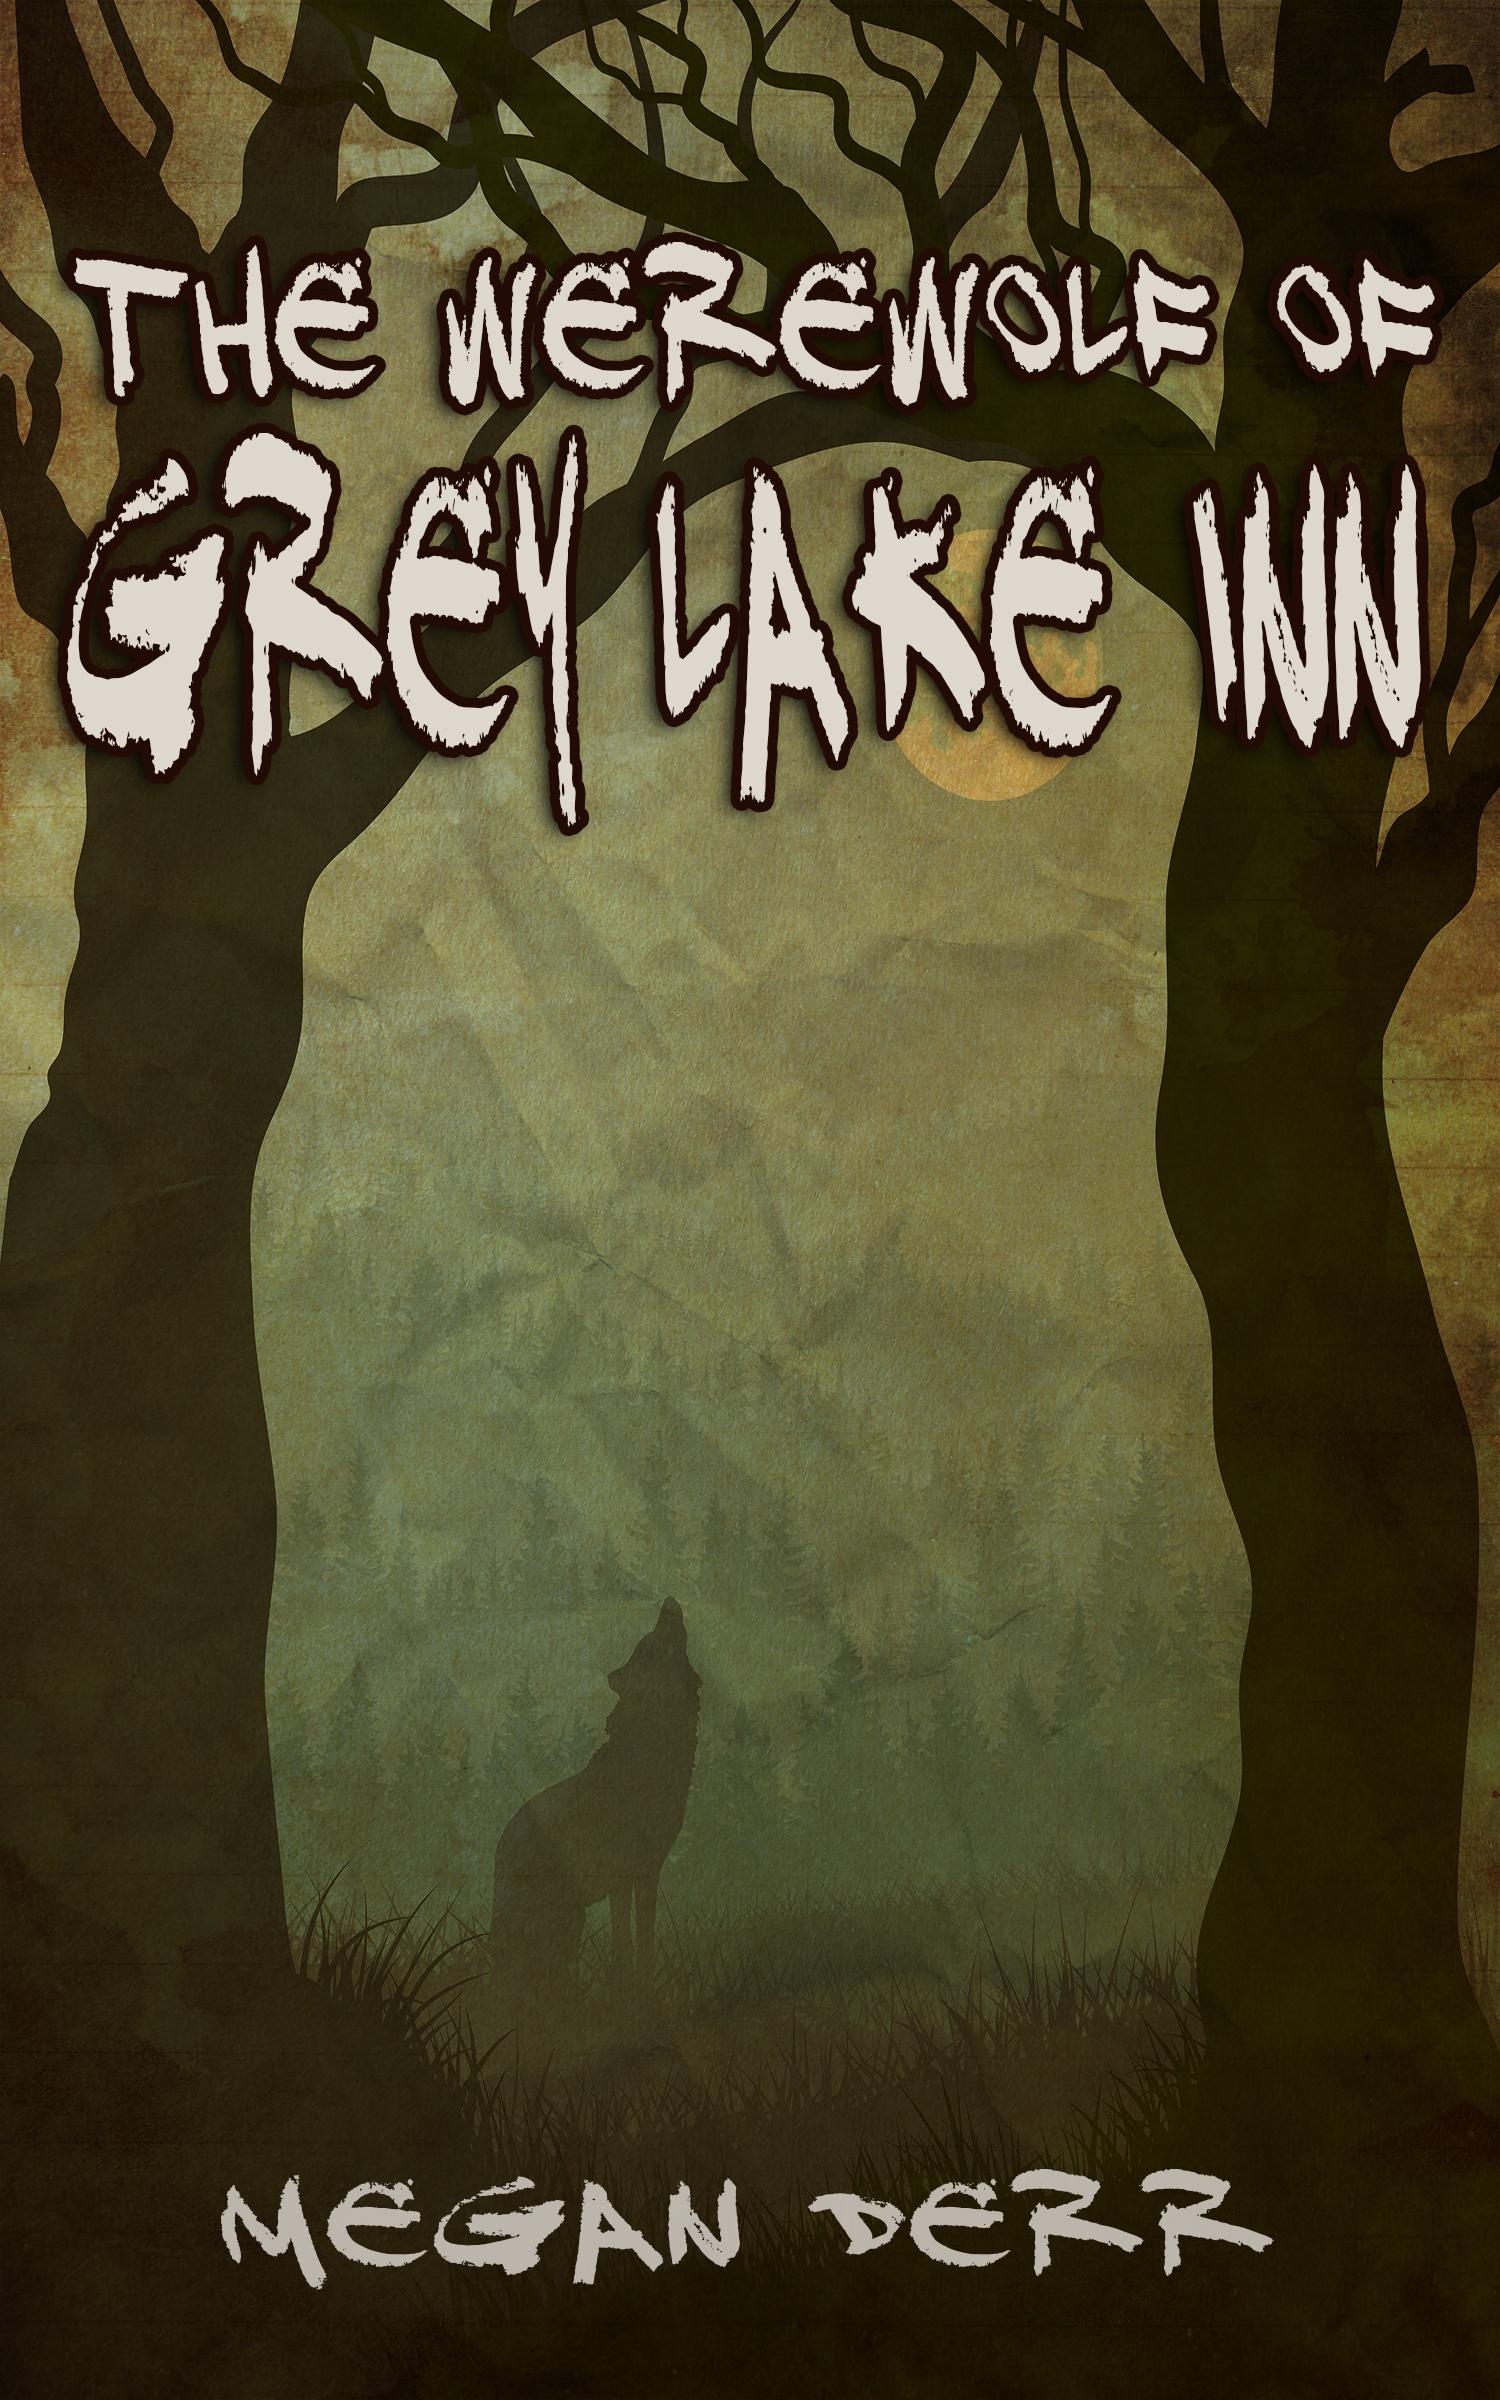 The Werewolf of Grey Lake Inn  by  Megan Derr